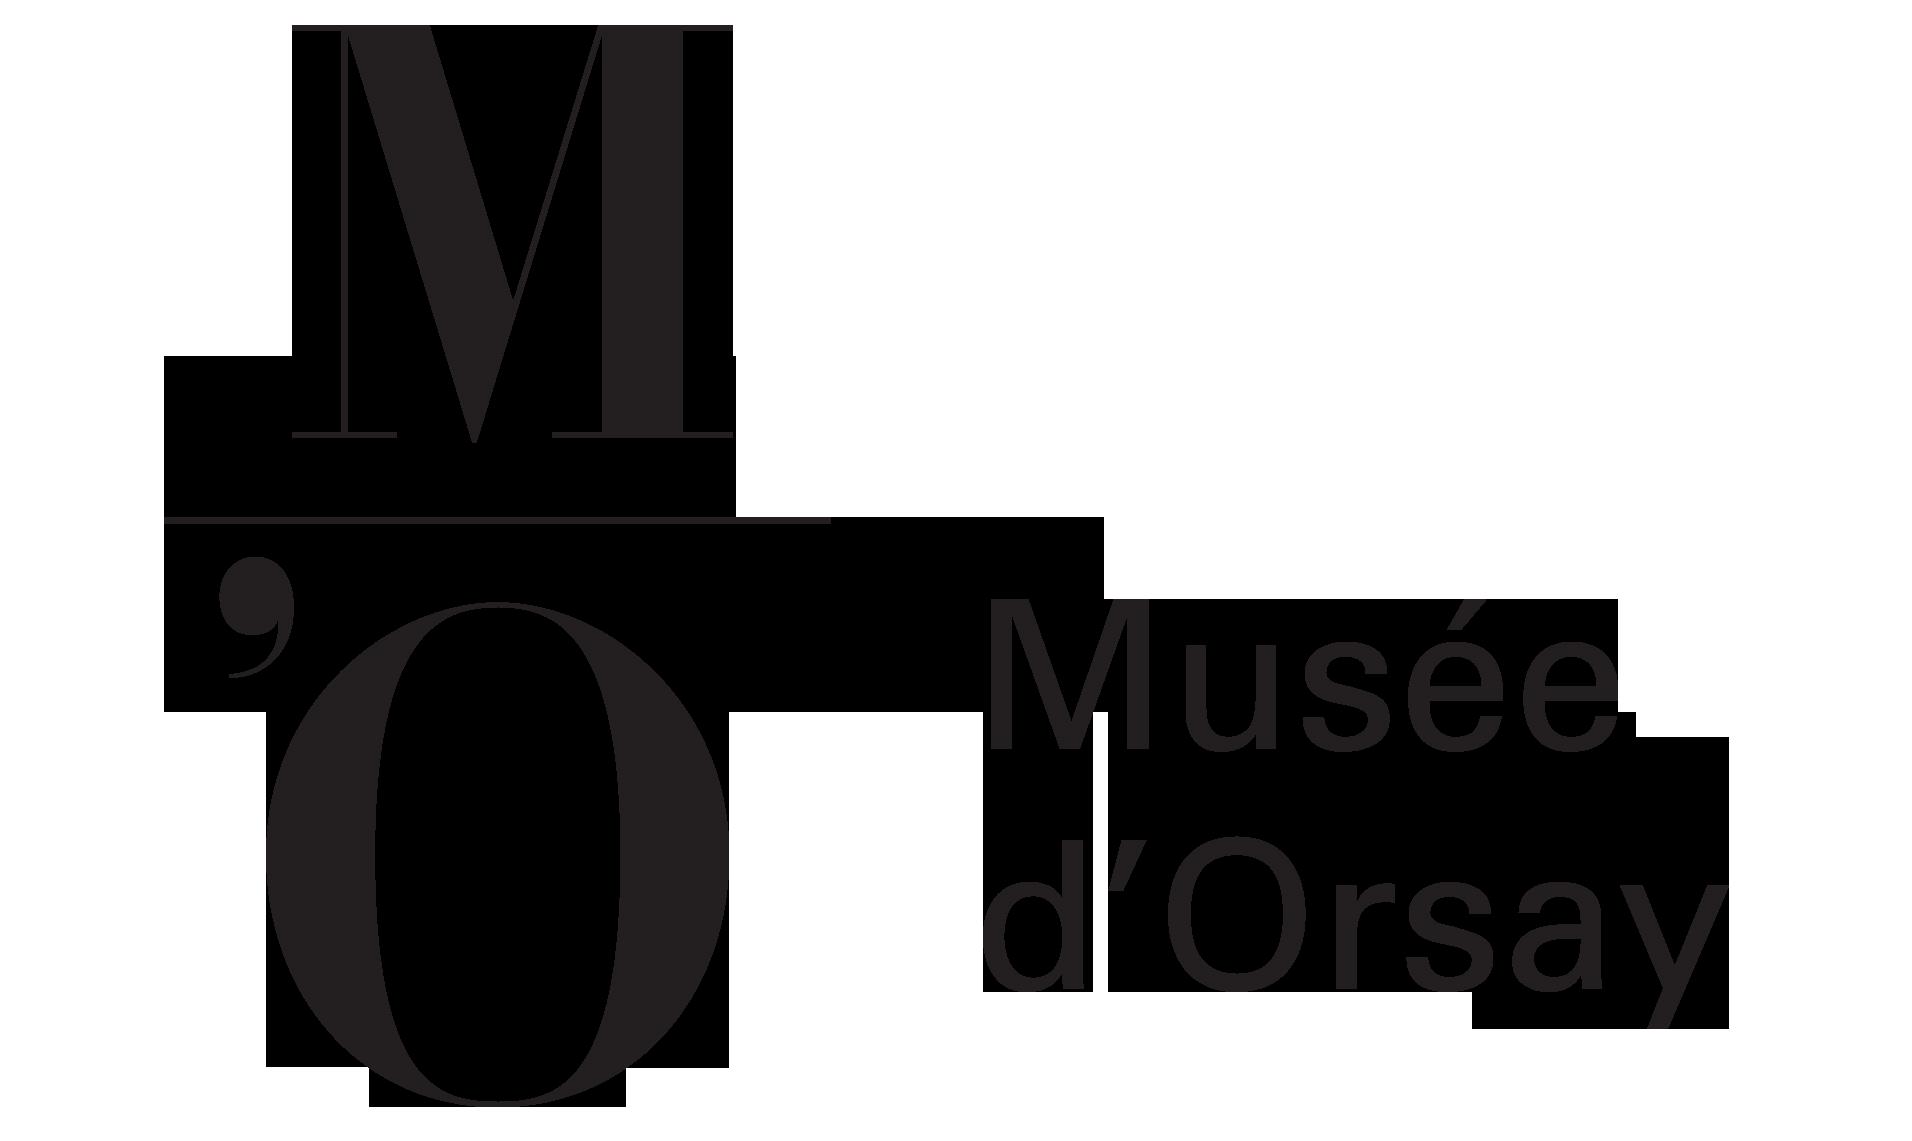 Logo_musée_d'Orsay.png